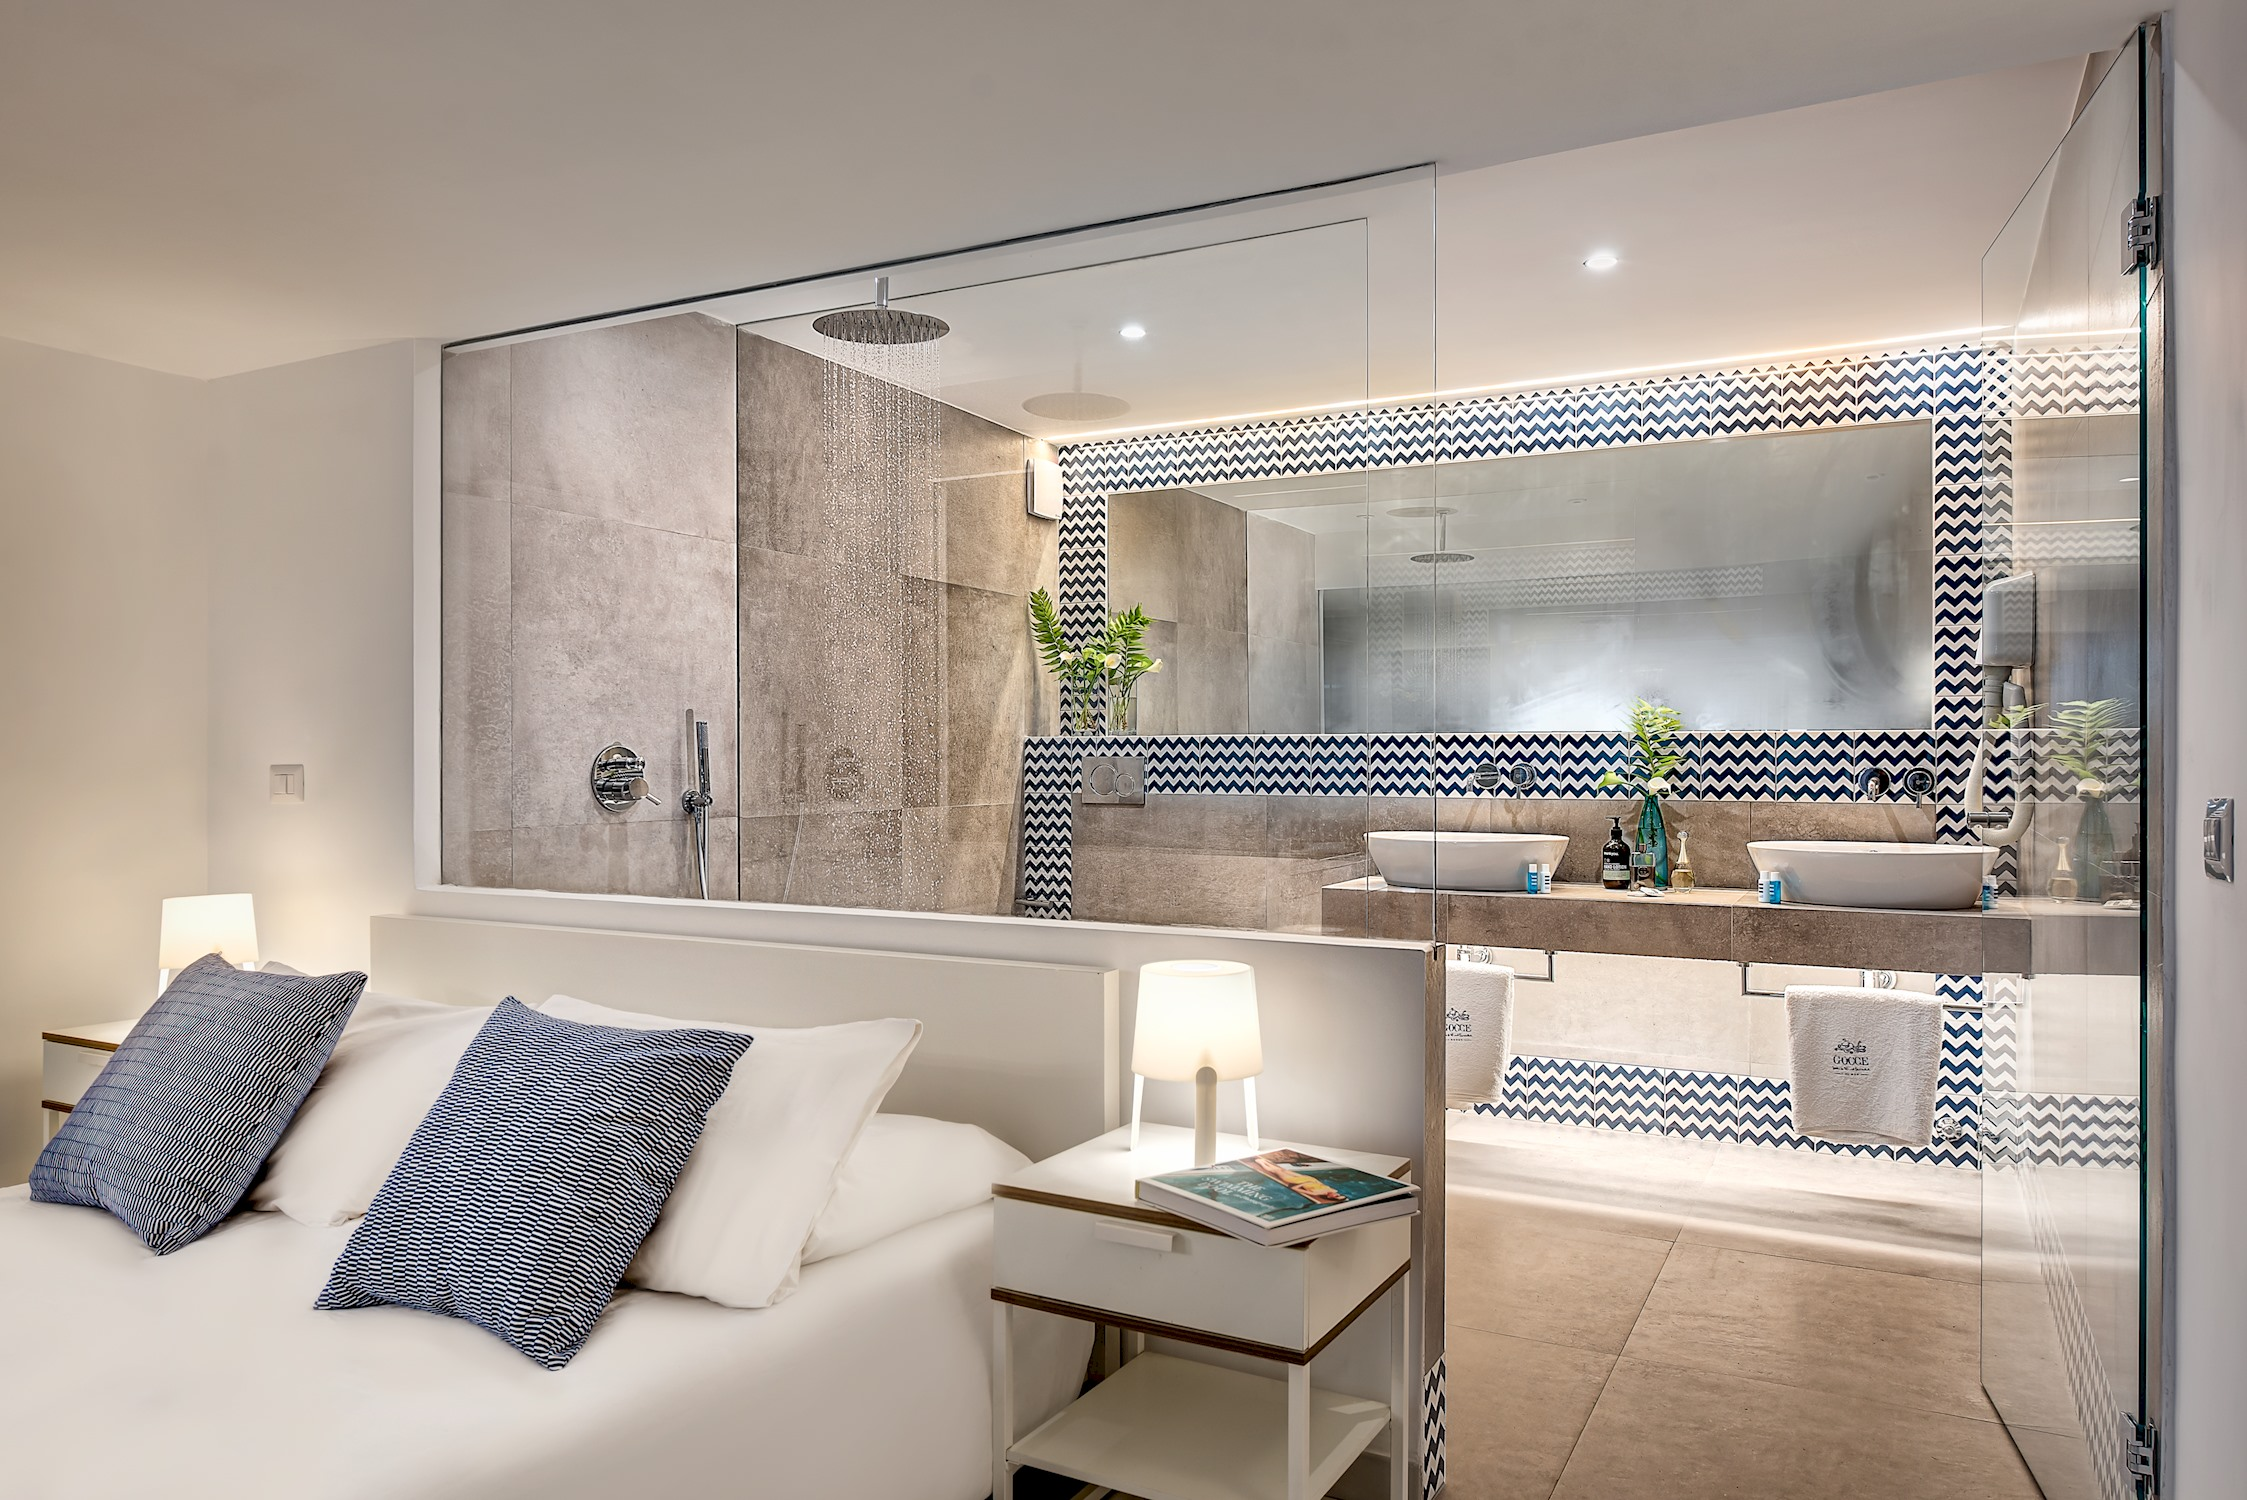 Apartment Gocce di Capri - 2 Bedroom Superior Apartment photo 19585653